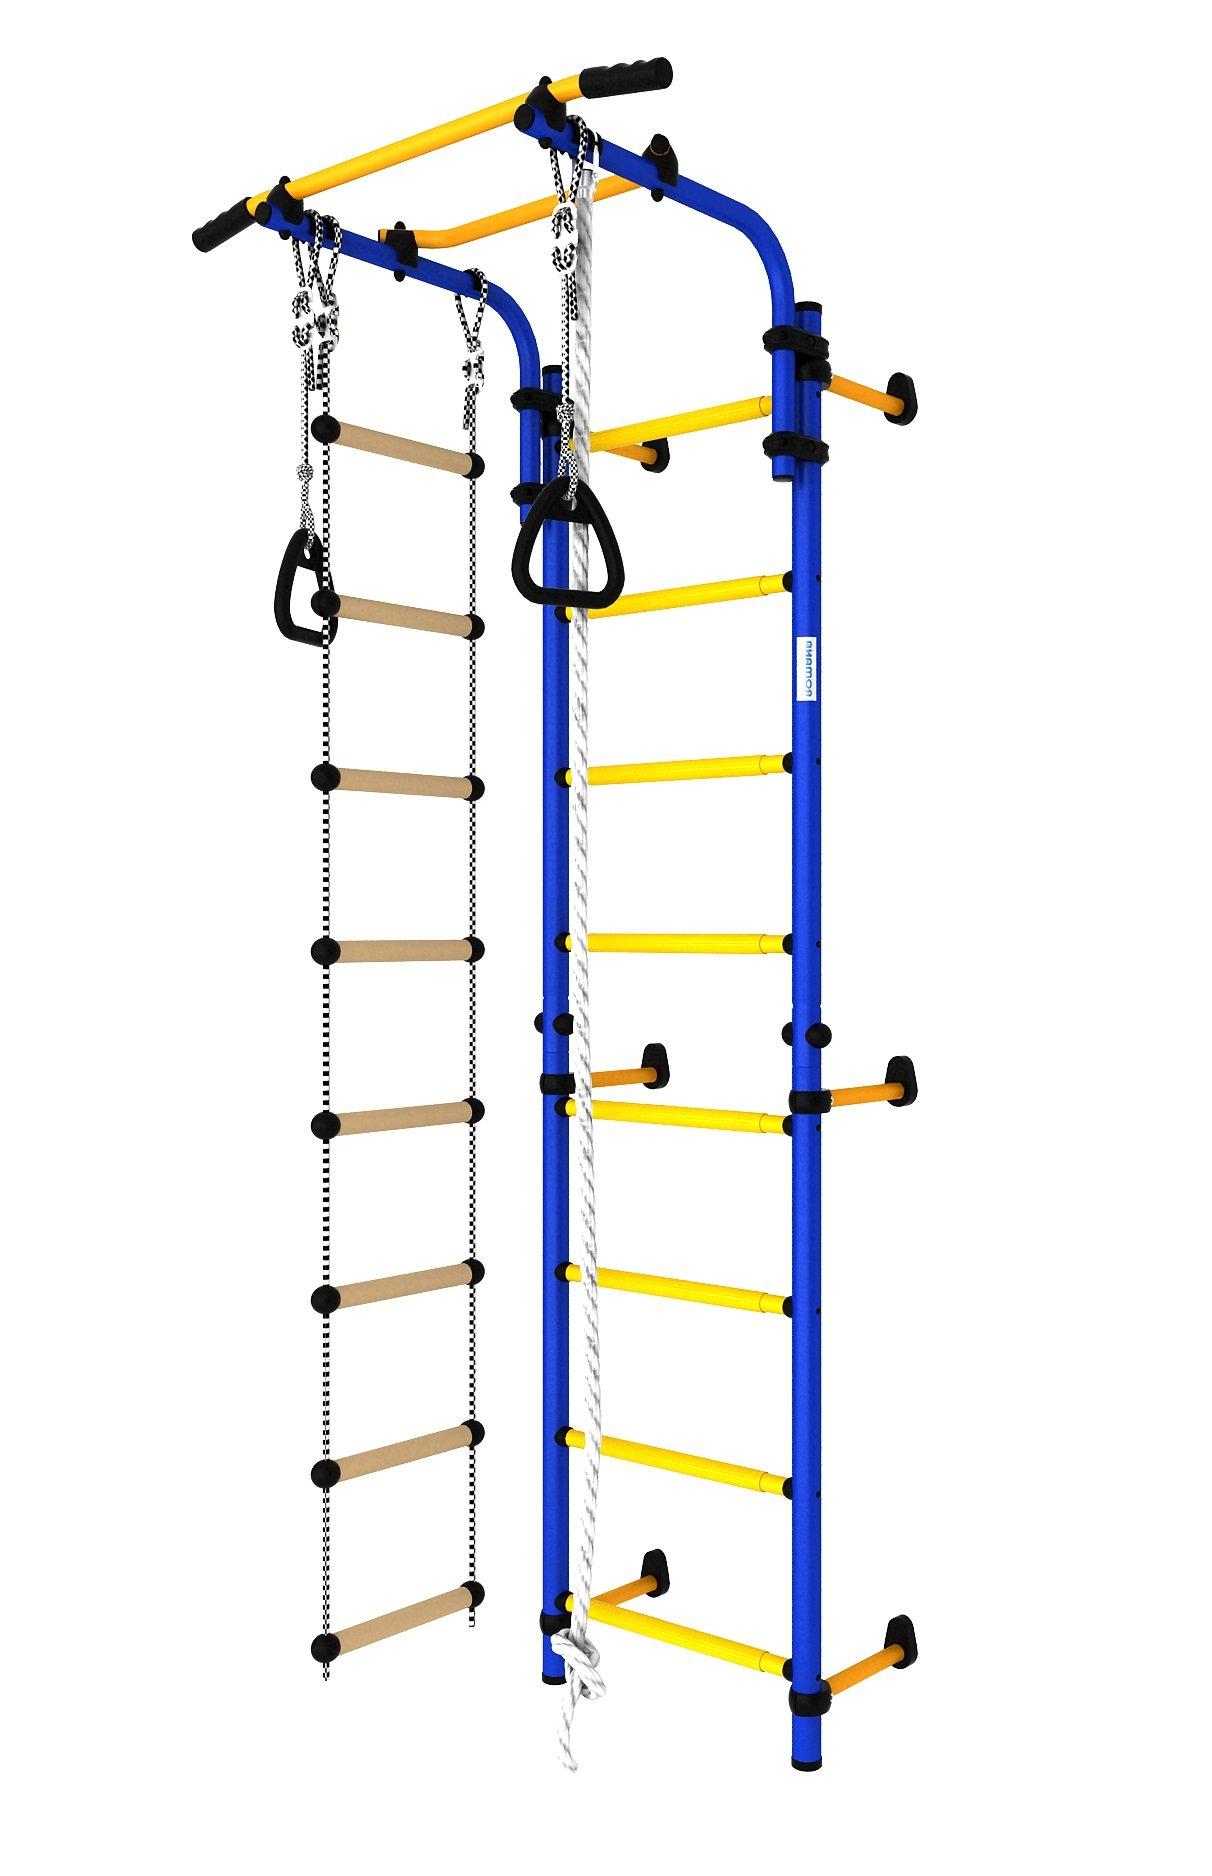 Christopeit barras de pared Hércules 1W en azul-amarillo, EG-KSK-001B